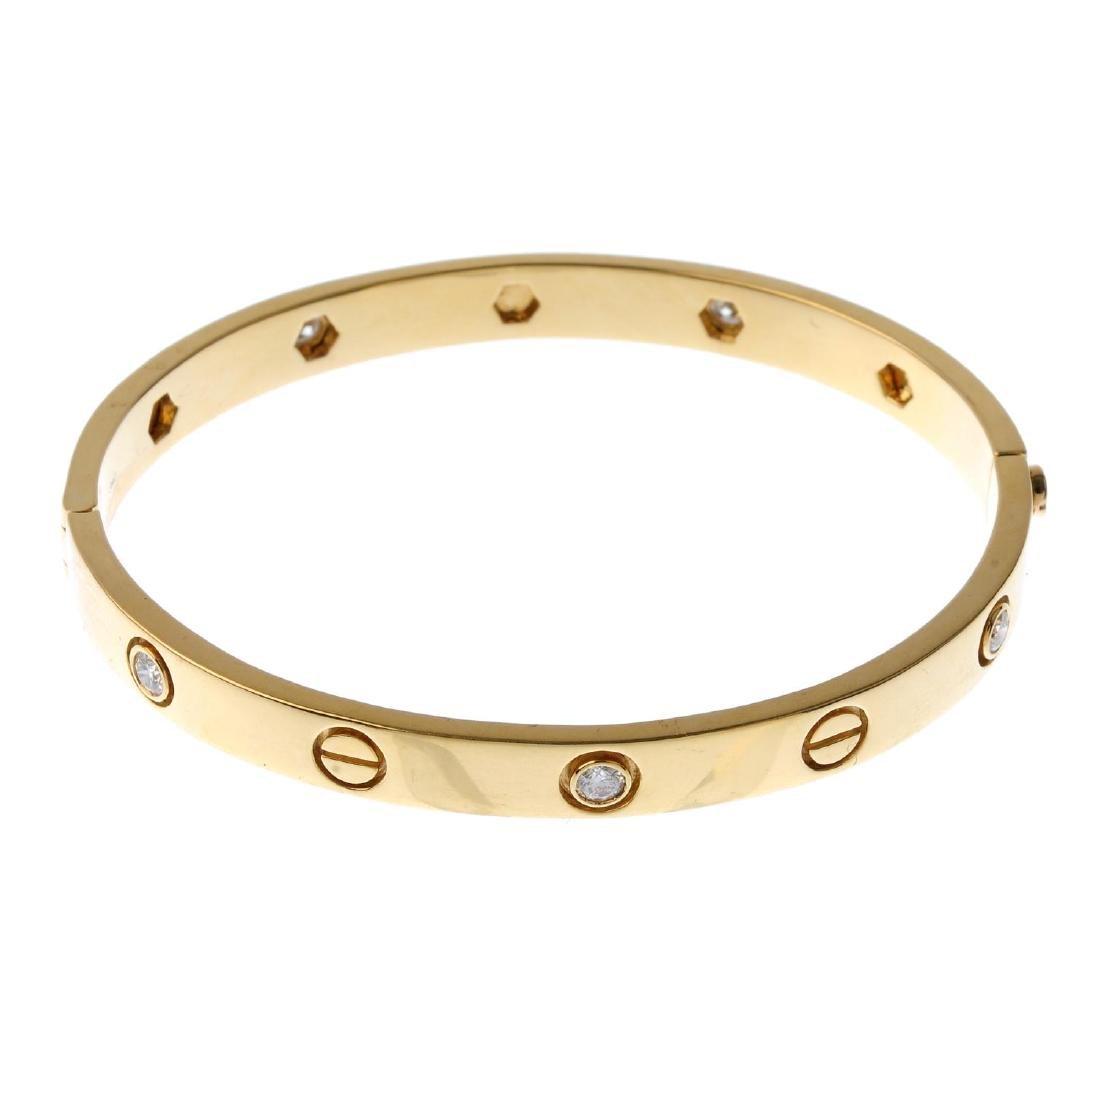 A diamond hinged bangle. Designed as an alternating